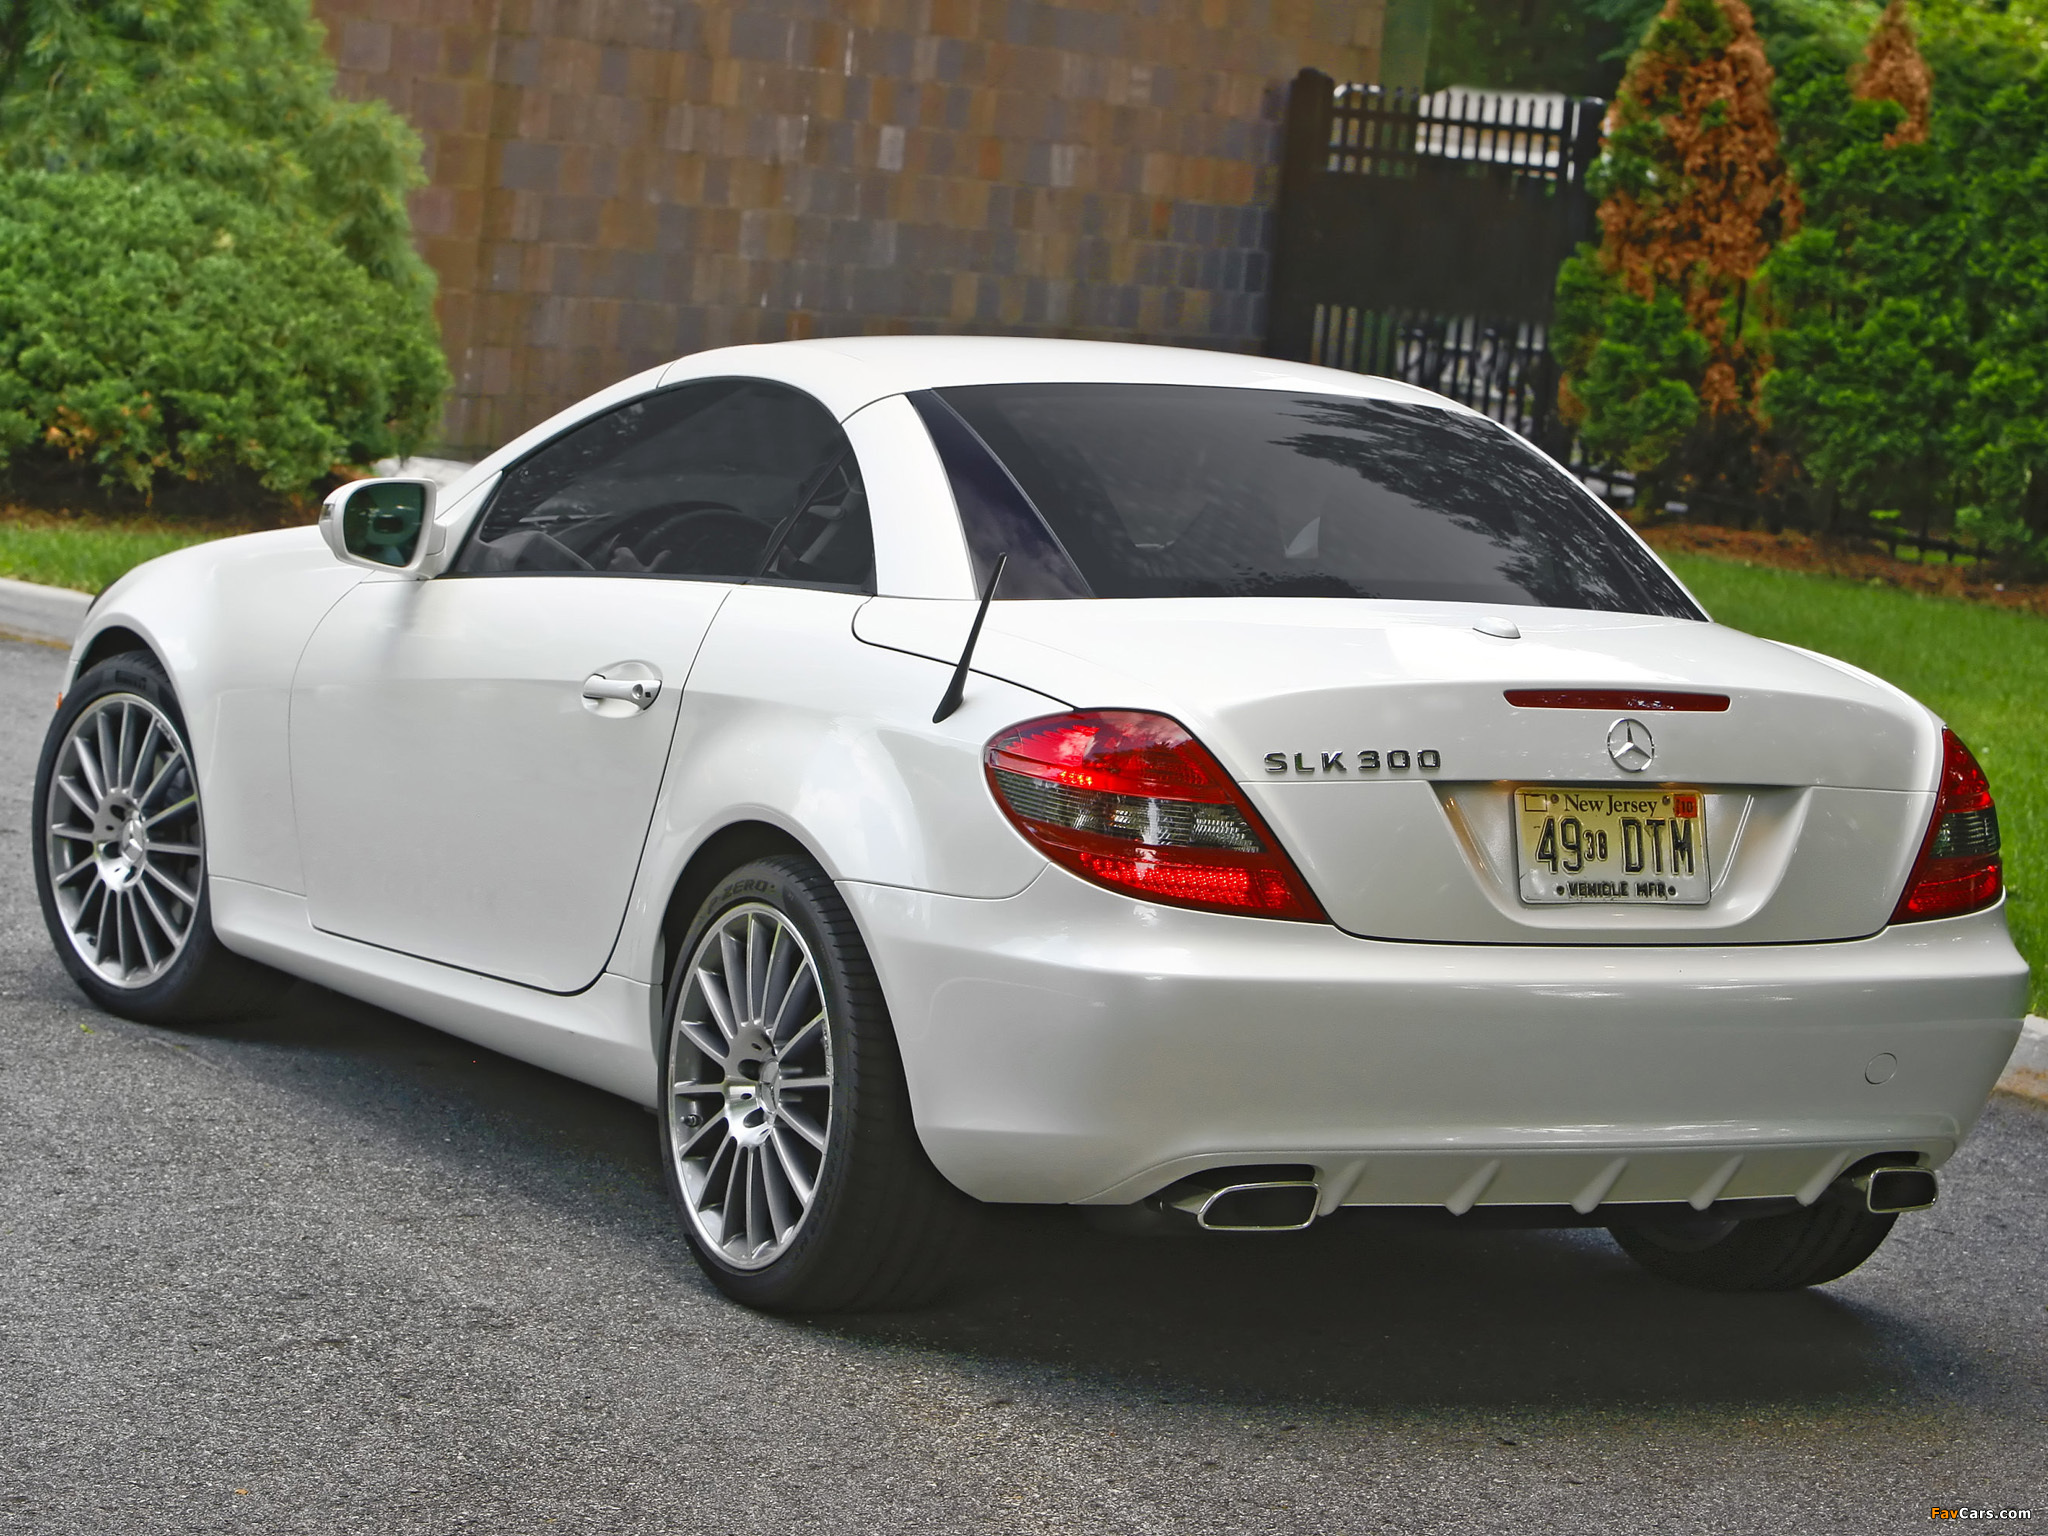 Mercedes benz slk 300 diamond white edition us spec r171 for Mercedes benz slk 300